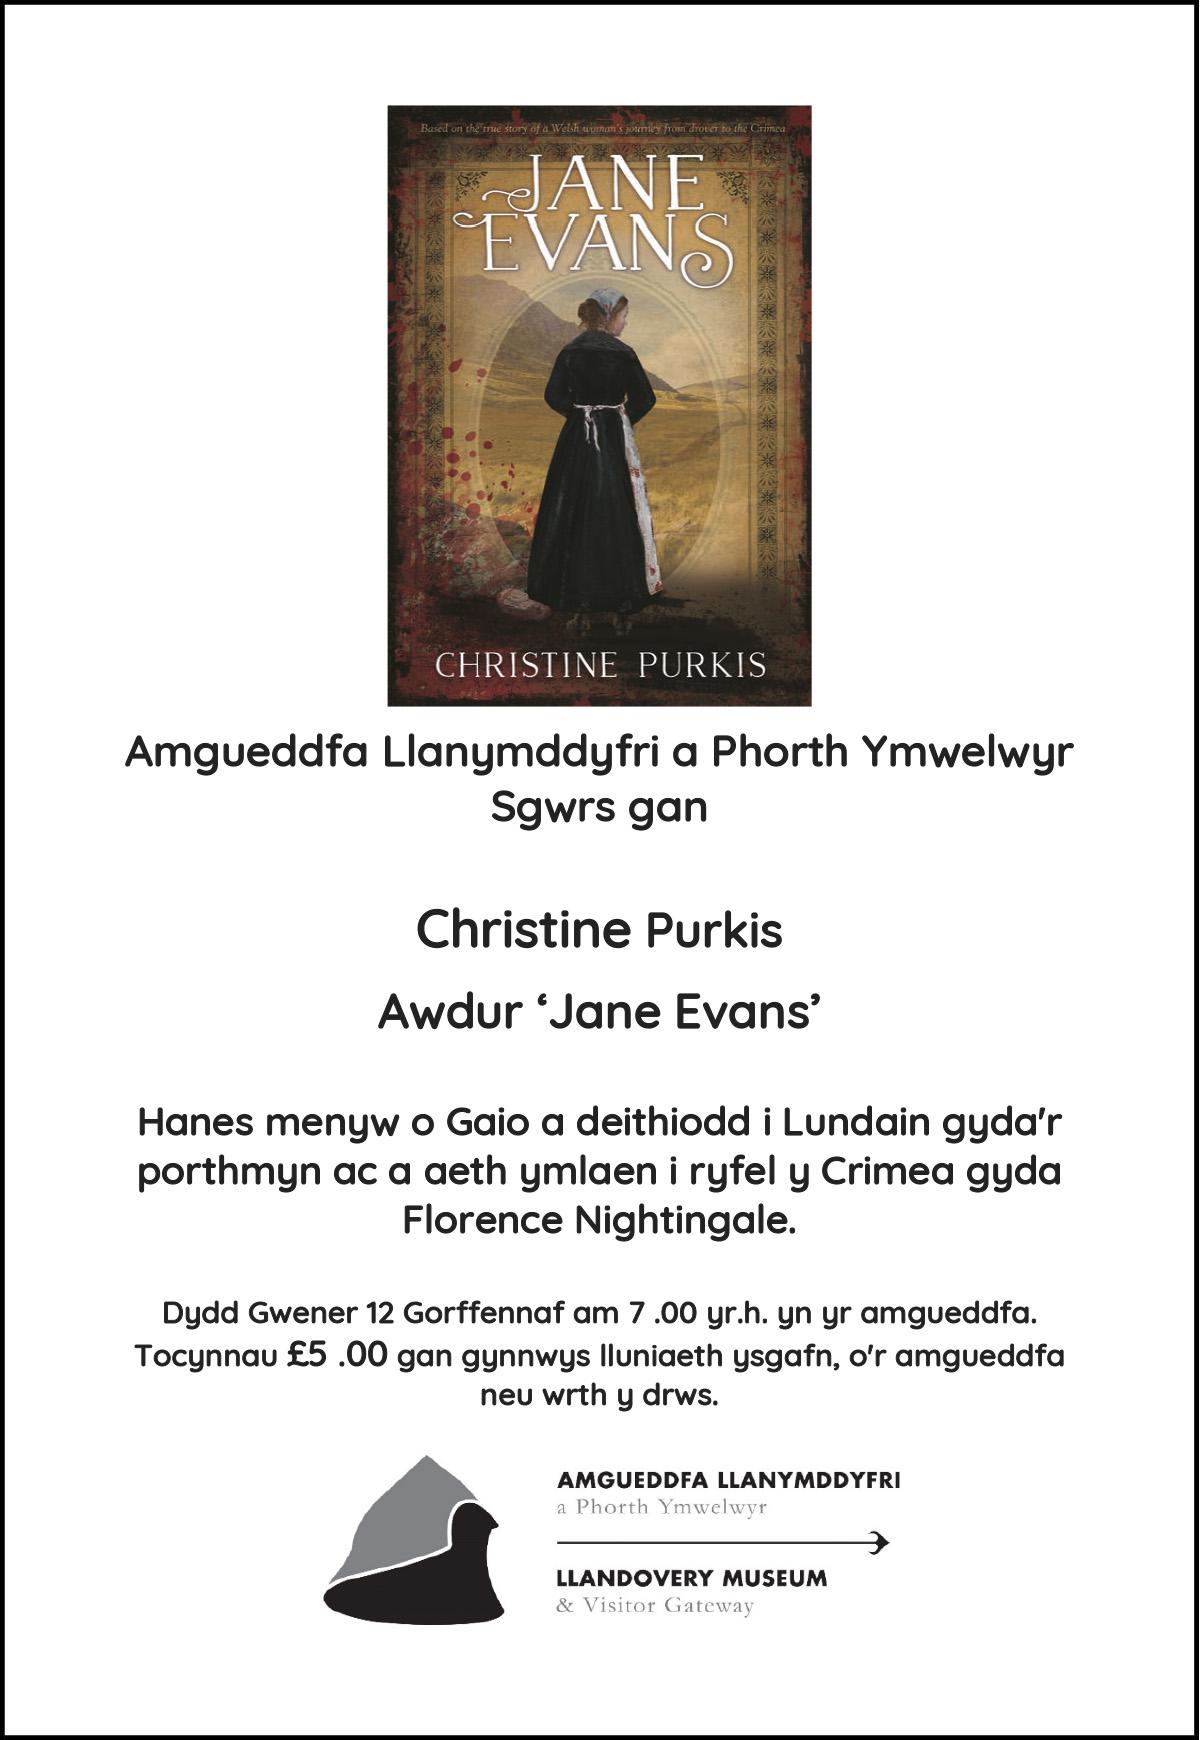 Microsoft Word - Jane Evans poster welsh.docx